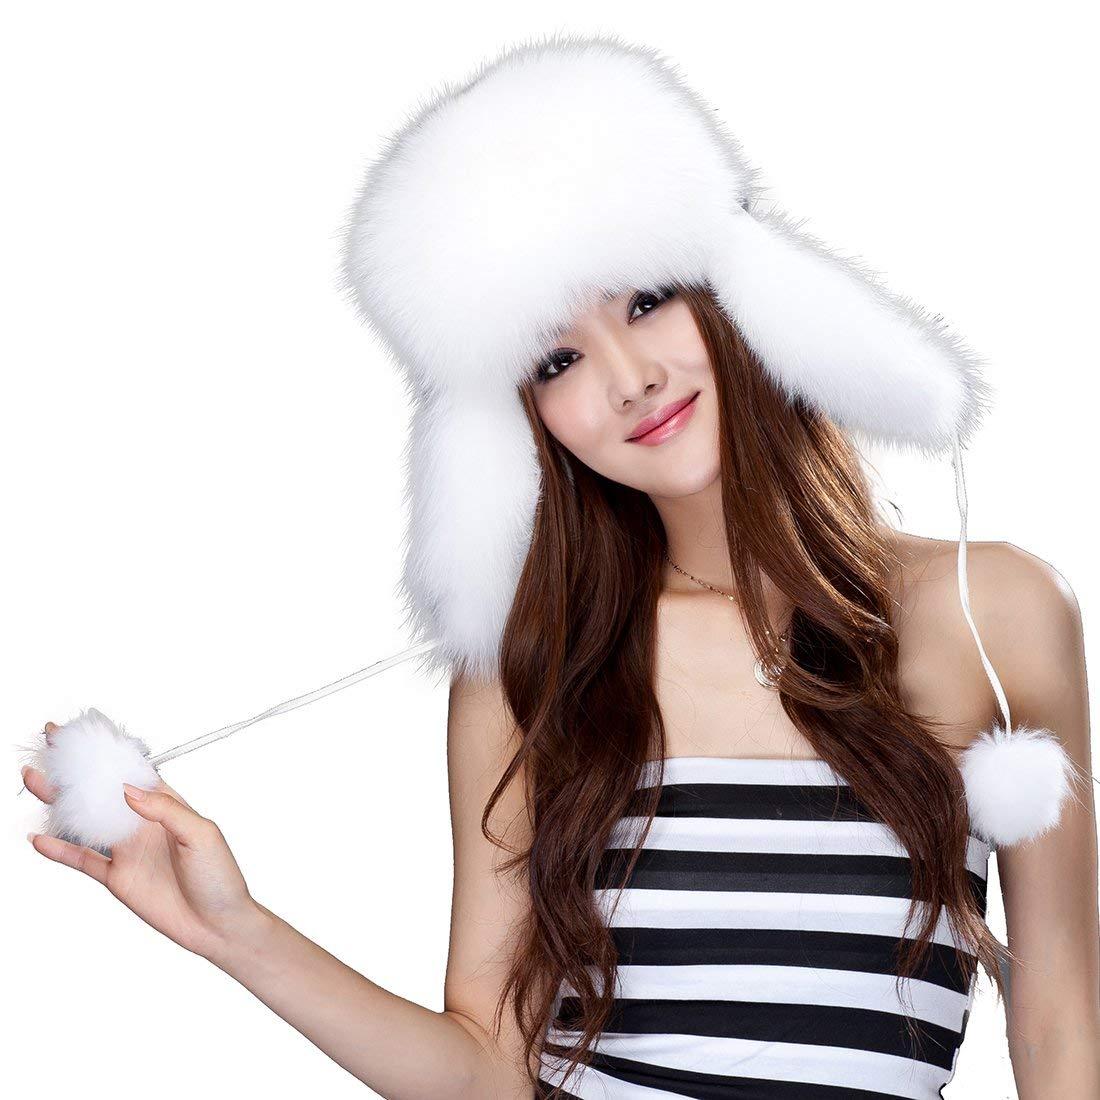 be4a58b90475e Get Quotations · URSFUR Fox Fur Russian Ushanka Hat Women s Fur Hat with  Earflaps   Pom-poms